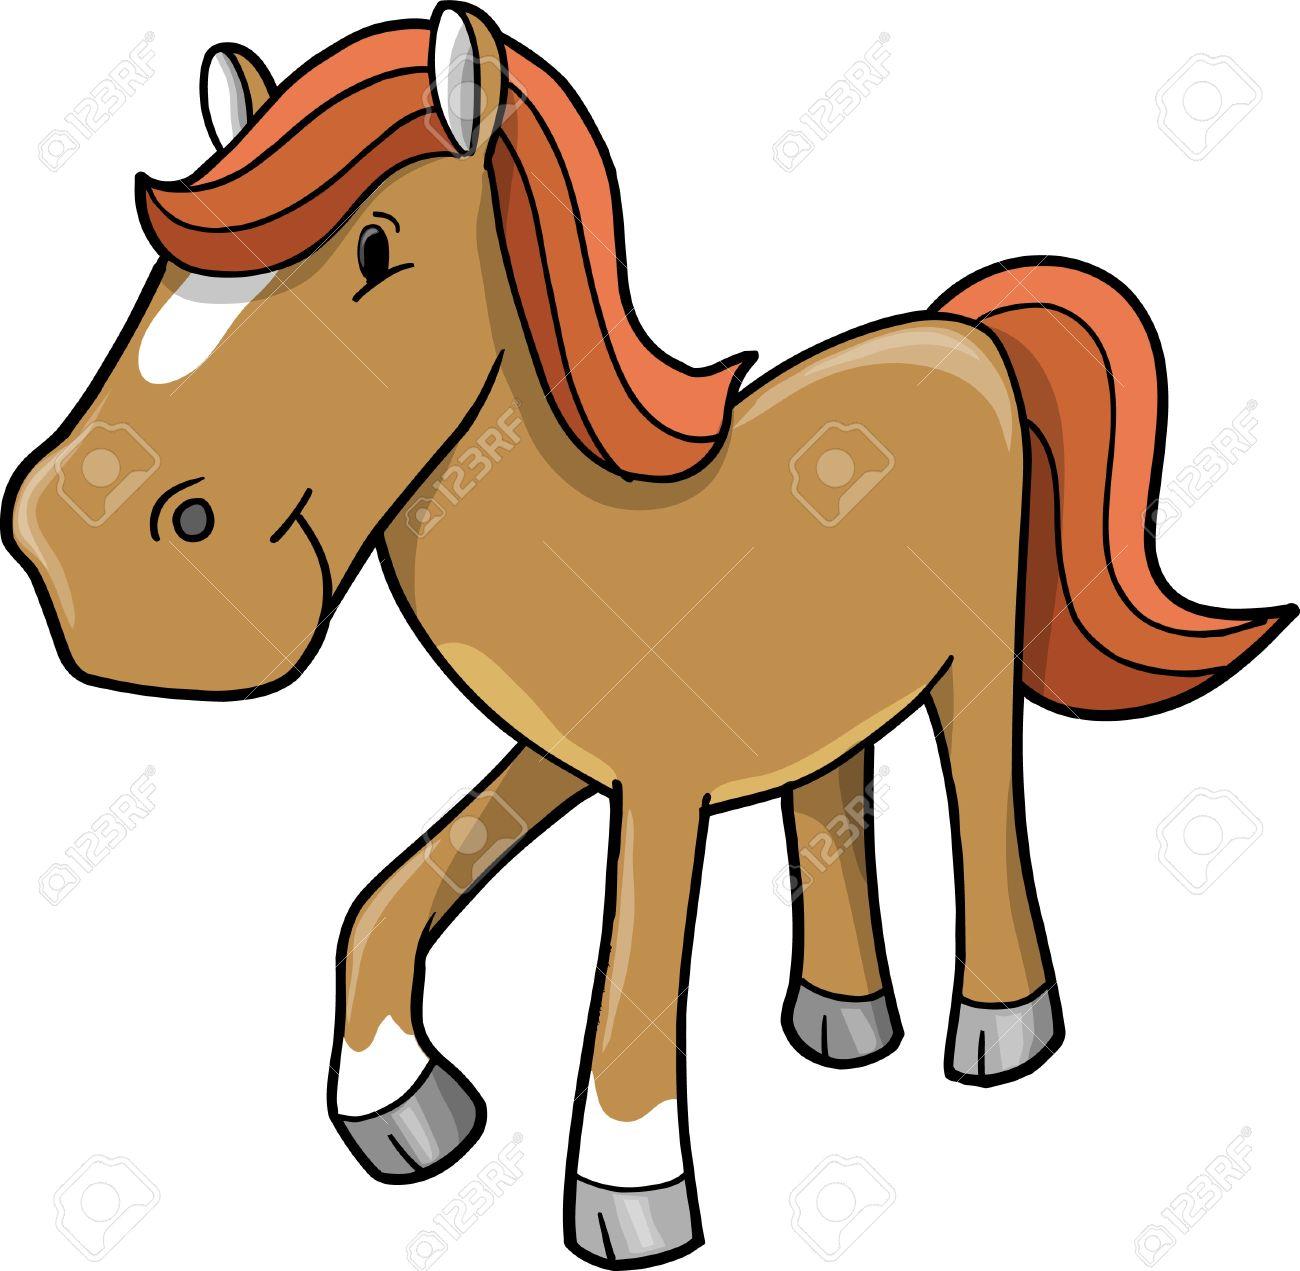 Cute Horse Pony Vector illustration.